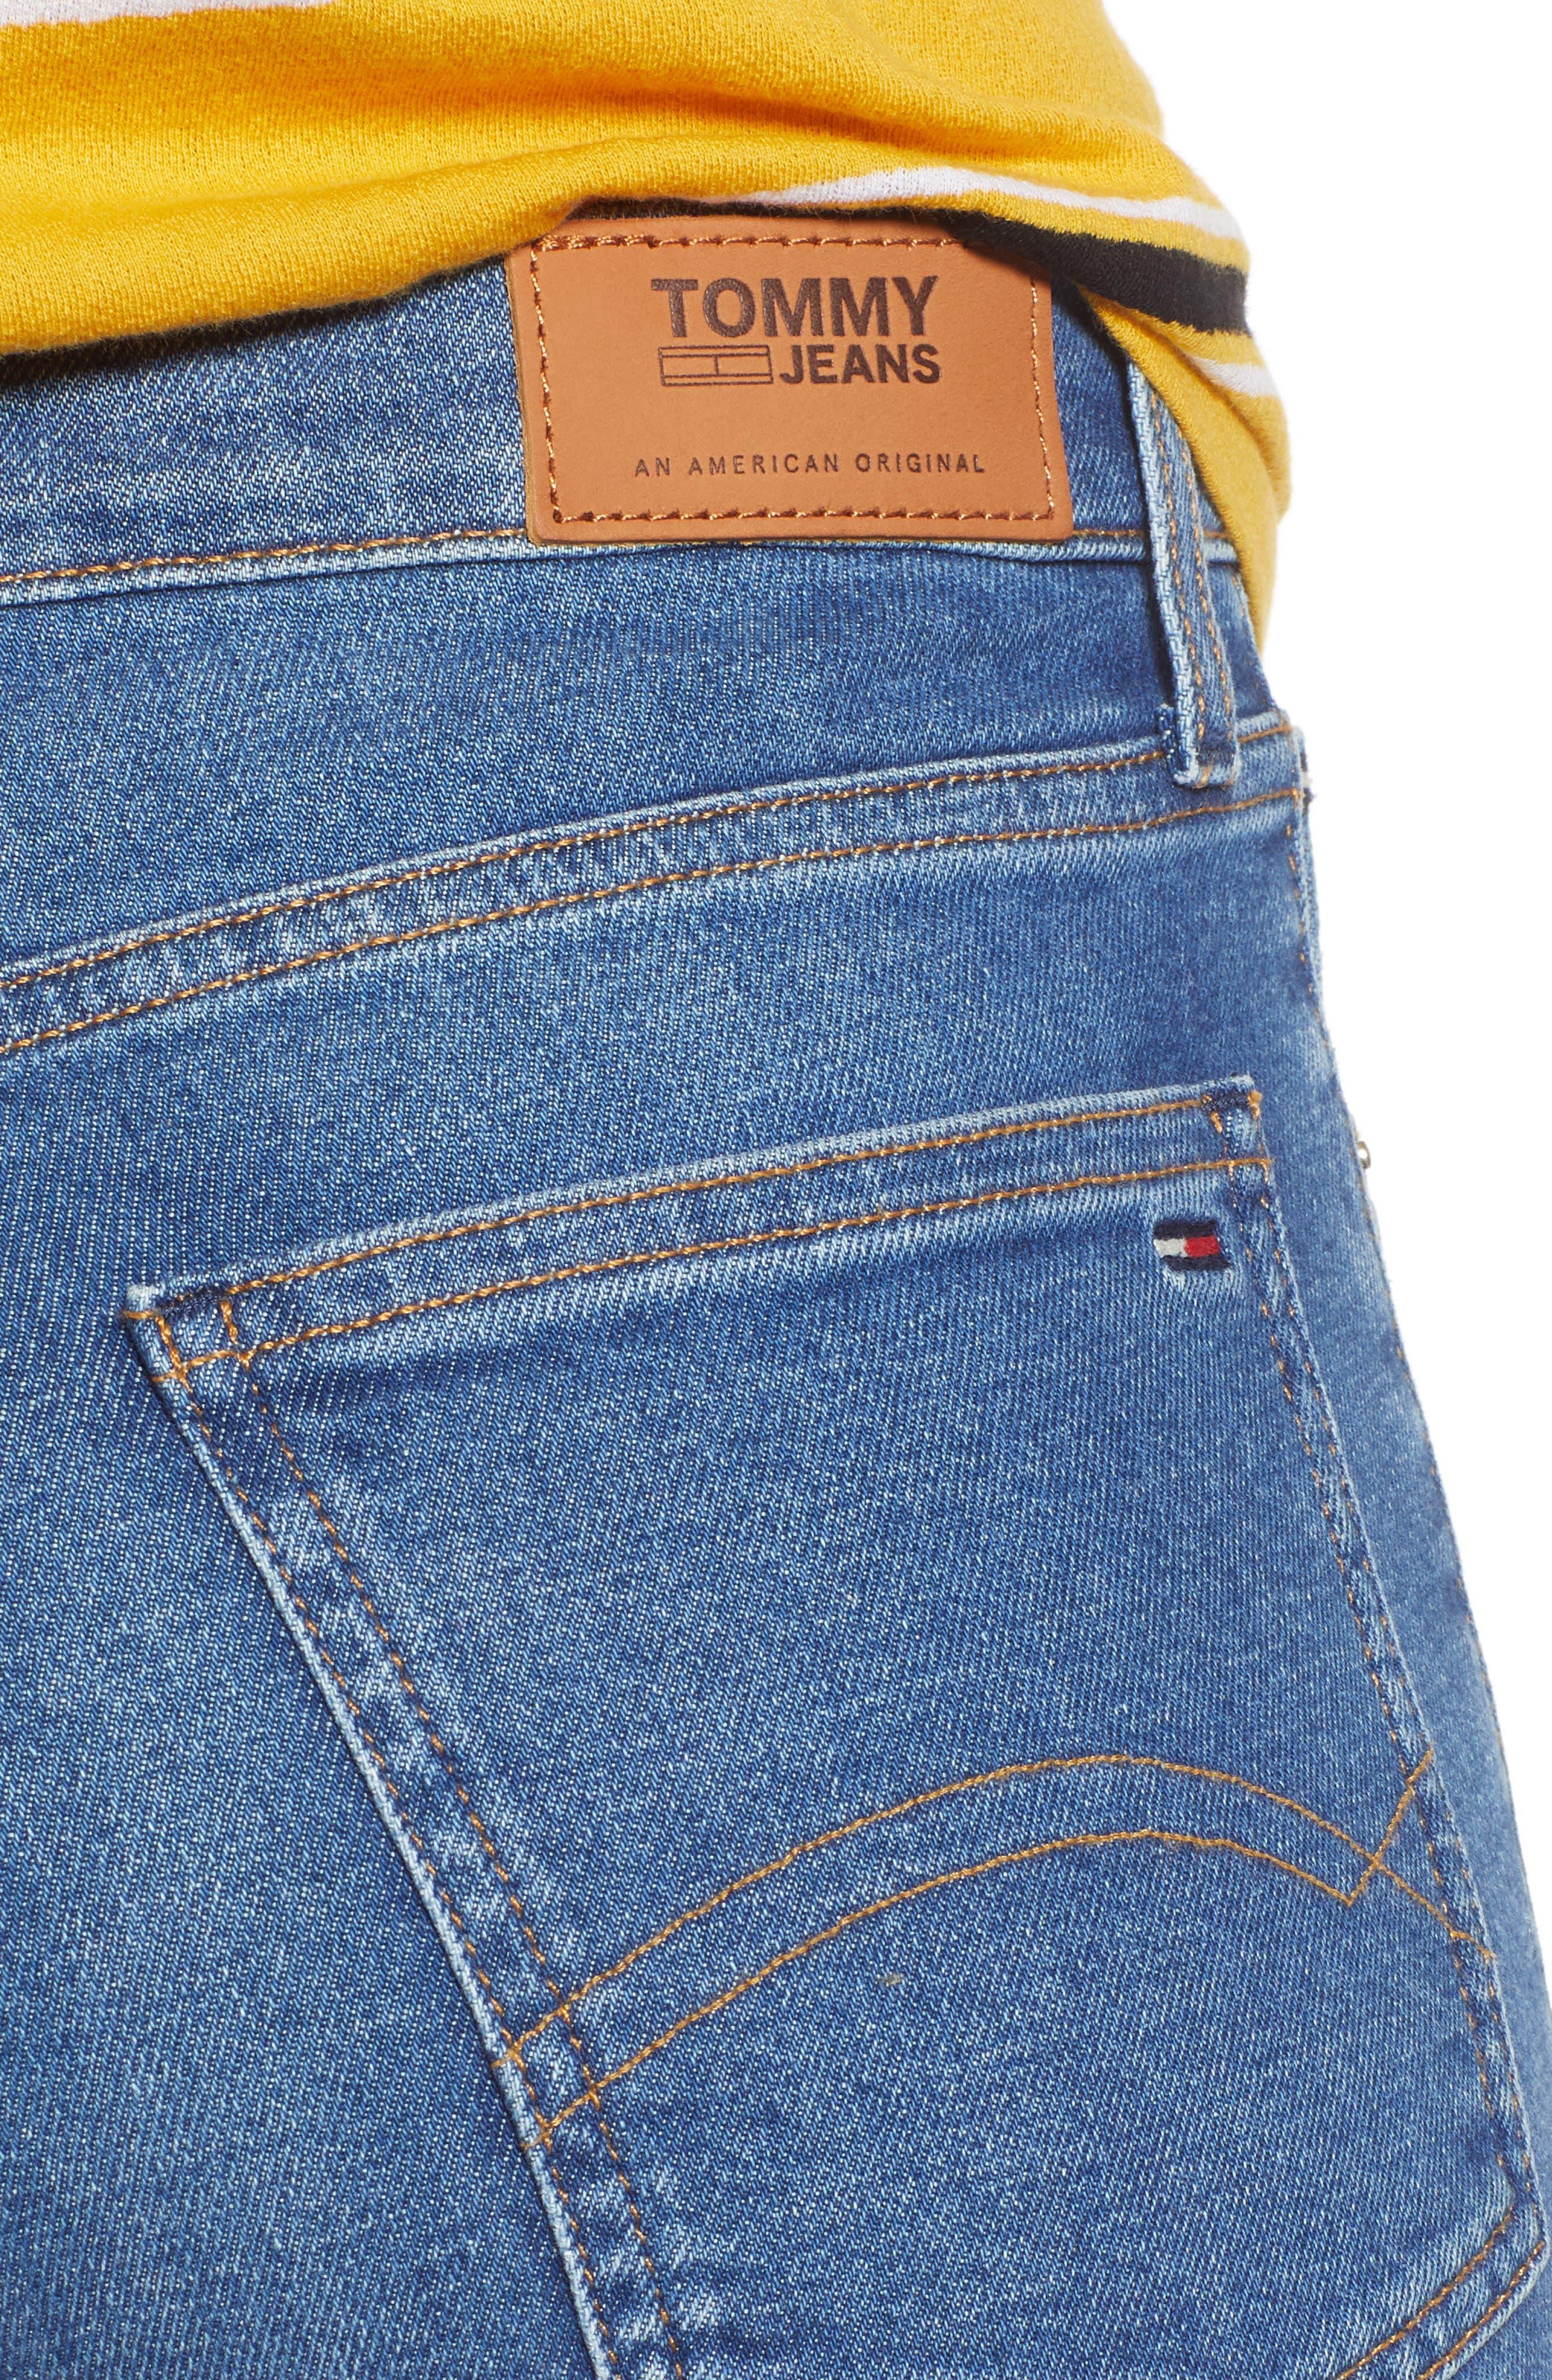 Izzy High Waist Slim Crop Jeans,                             Alternate thumbnail 4, color,                             400